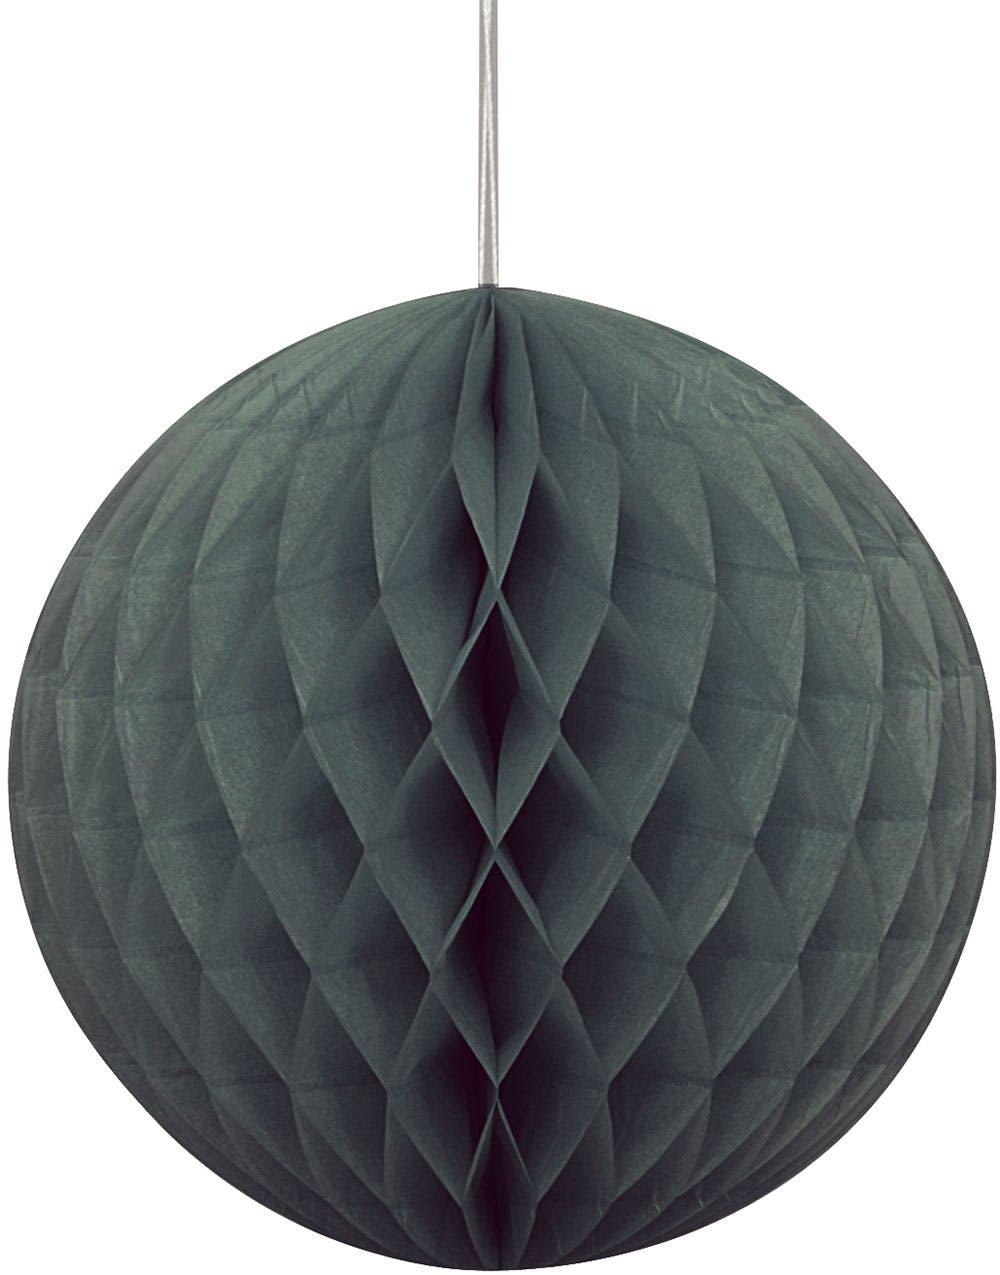 discount sale 18391 0cf78 Svart Honeycomb Ball 20 cm. Pek for zoom. -40%